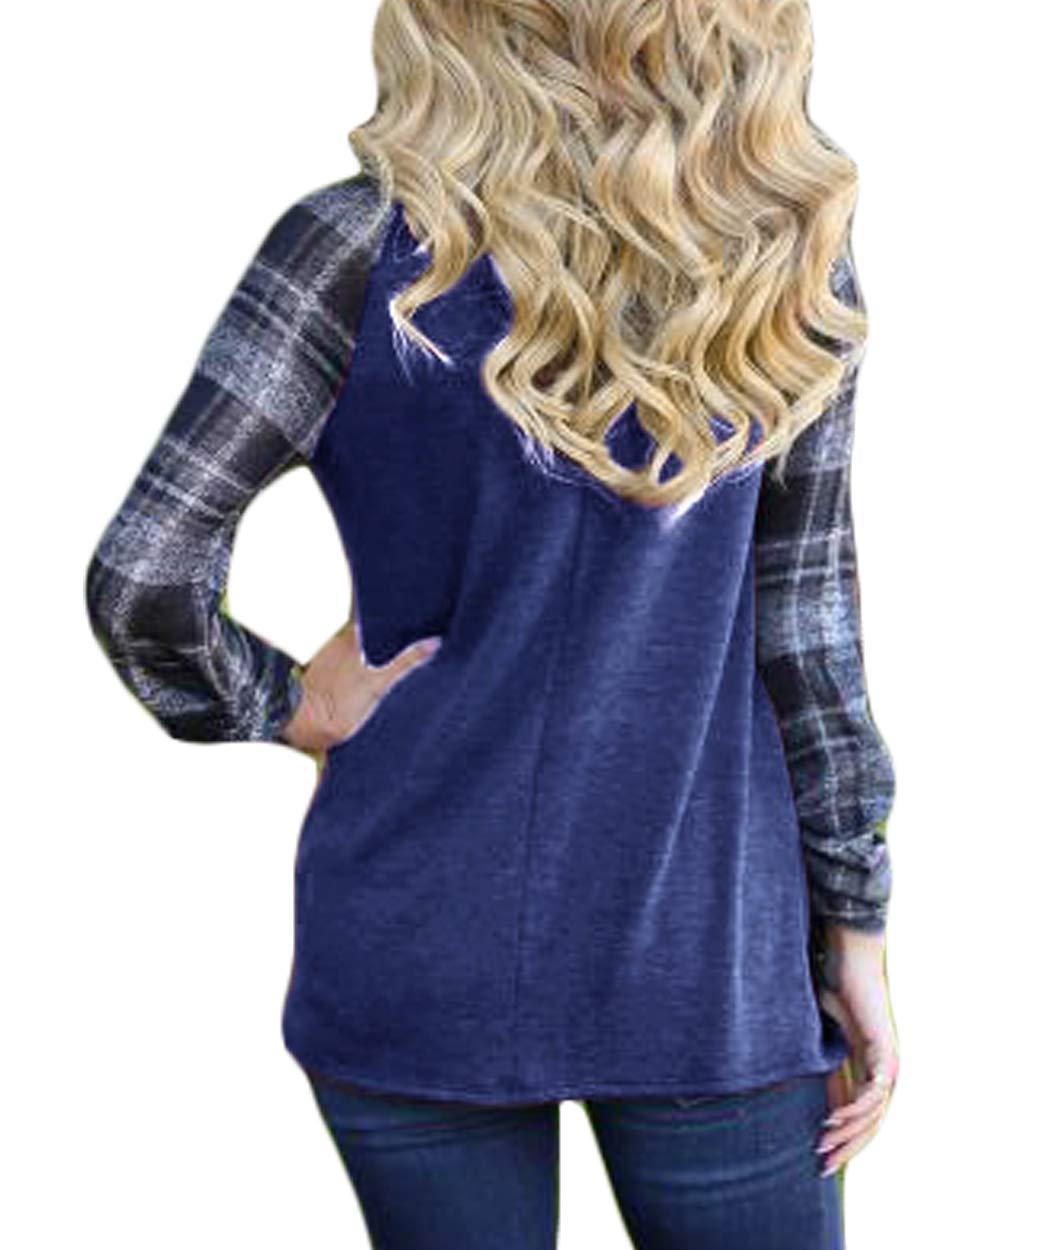 Eanklosco Women Long Sleeve Tops Plaid Patchwork Shirt Casual Round Neck Color Block Tunic Blouse (M, Blue)